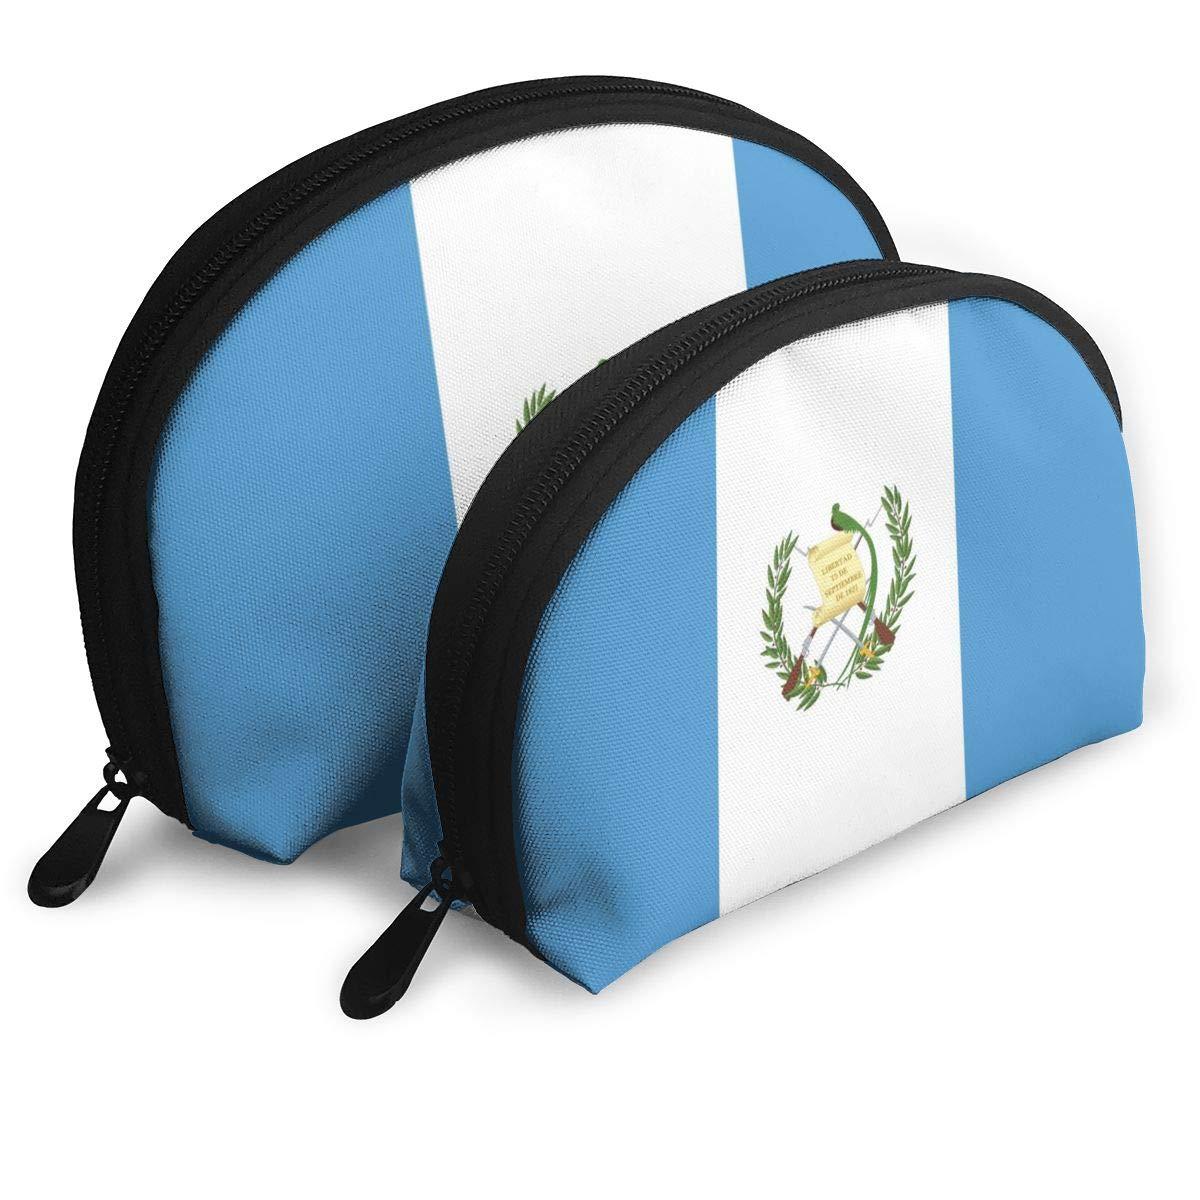 Half Moon Cosmetic Beauty Bag,Flag Of Guatemala Handy Cosmetic Pouch Clutch Makeup Bag For Women Girls